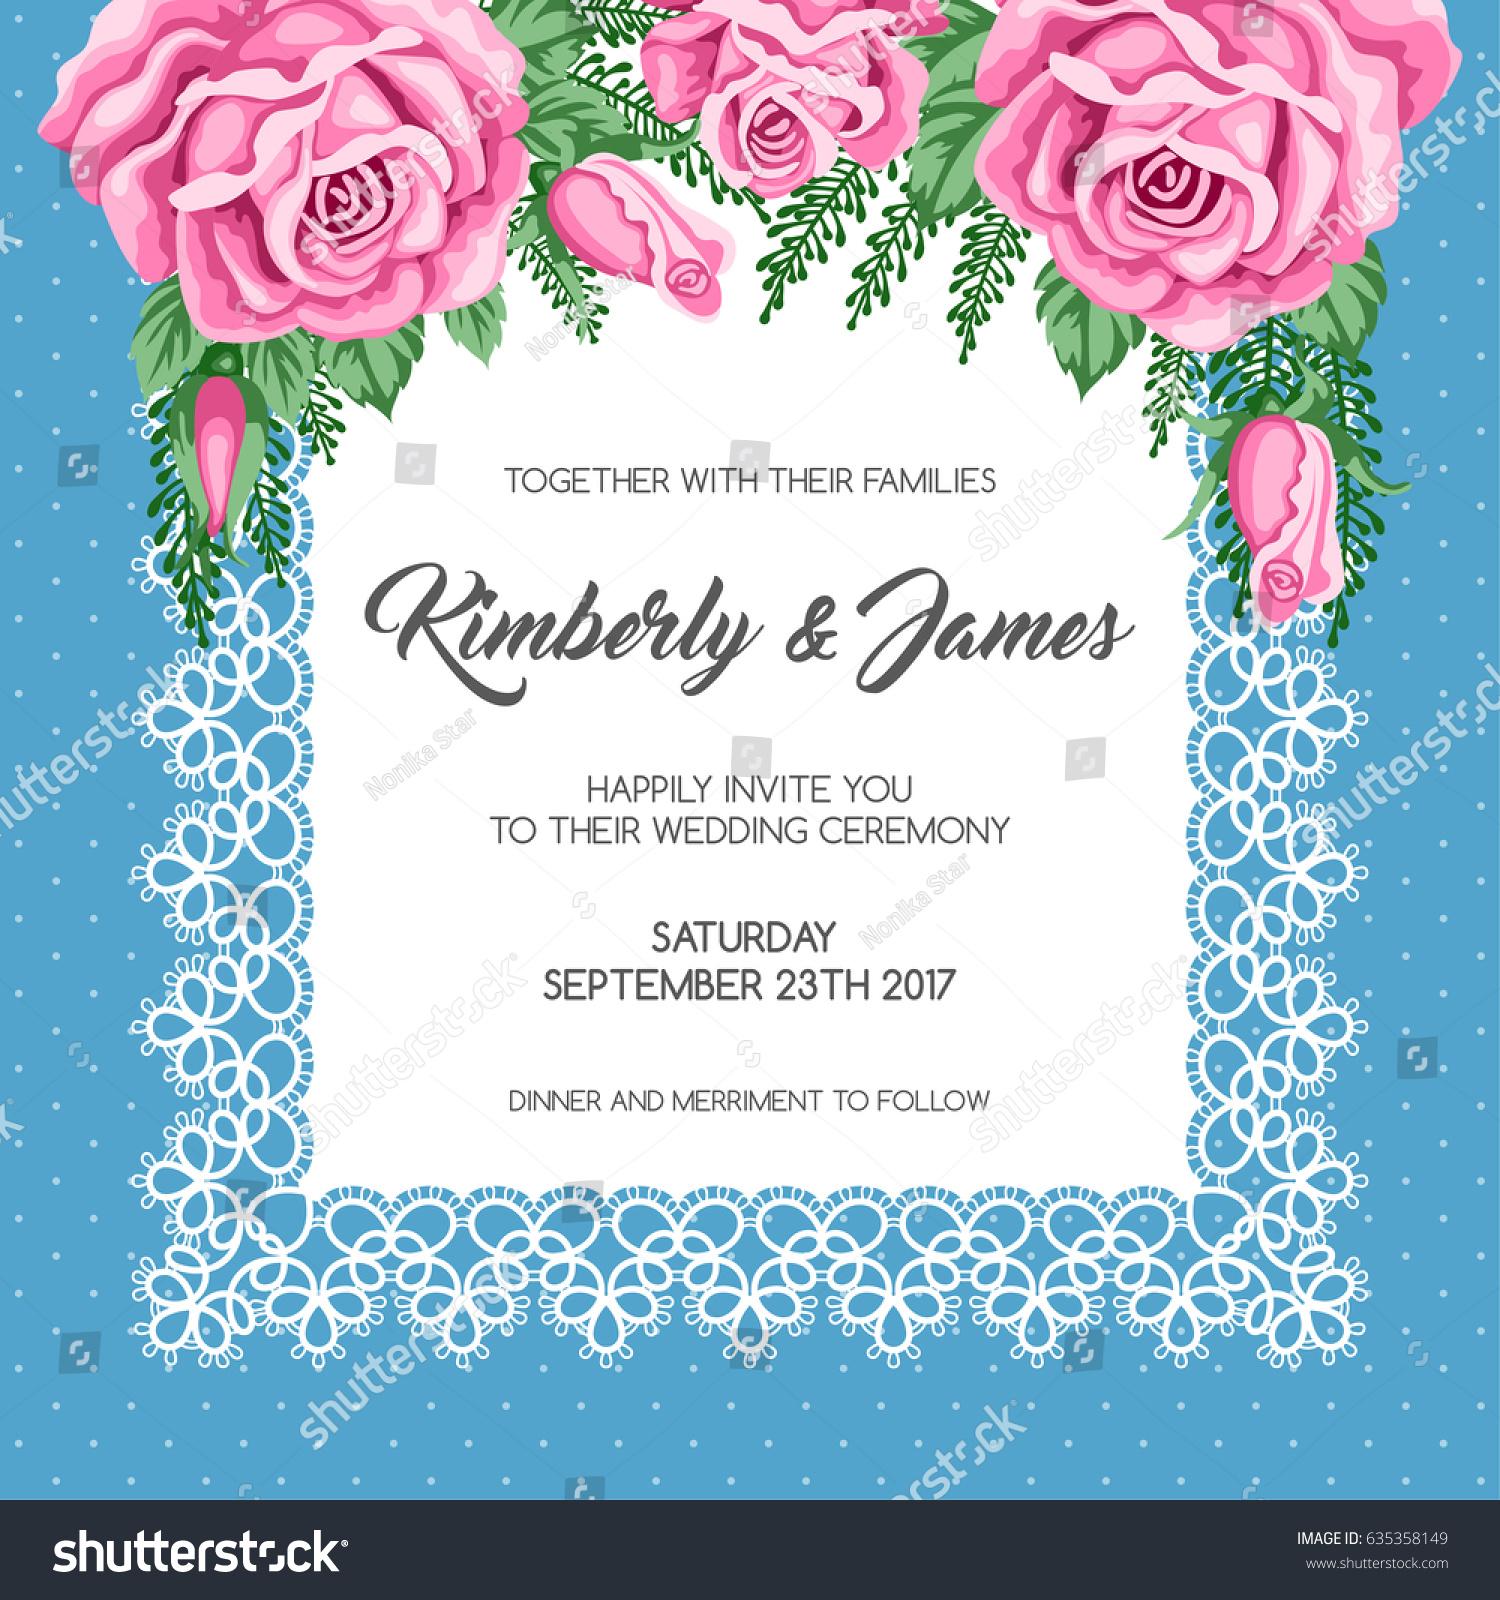 30 Unique Wedding Invitation Template Floral Pics Wedding